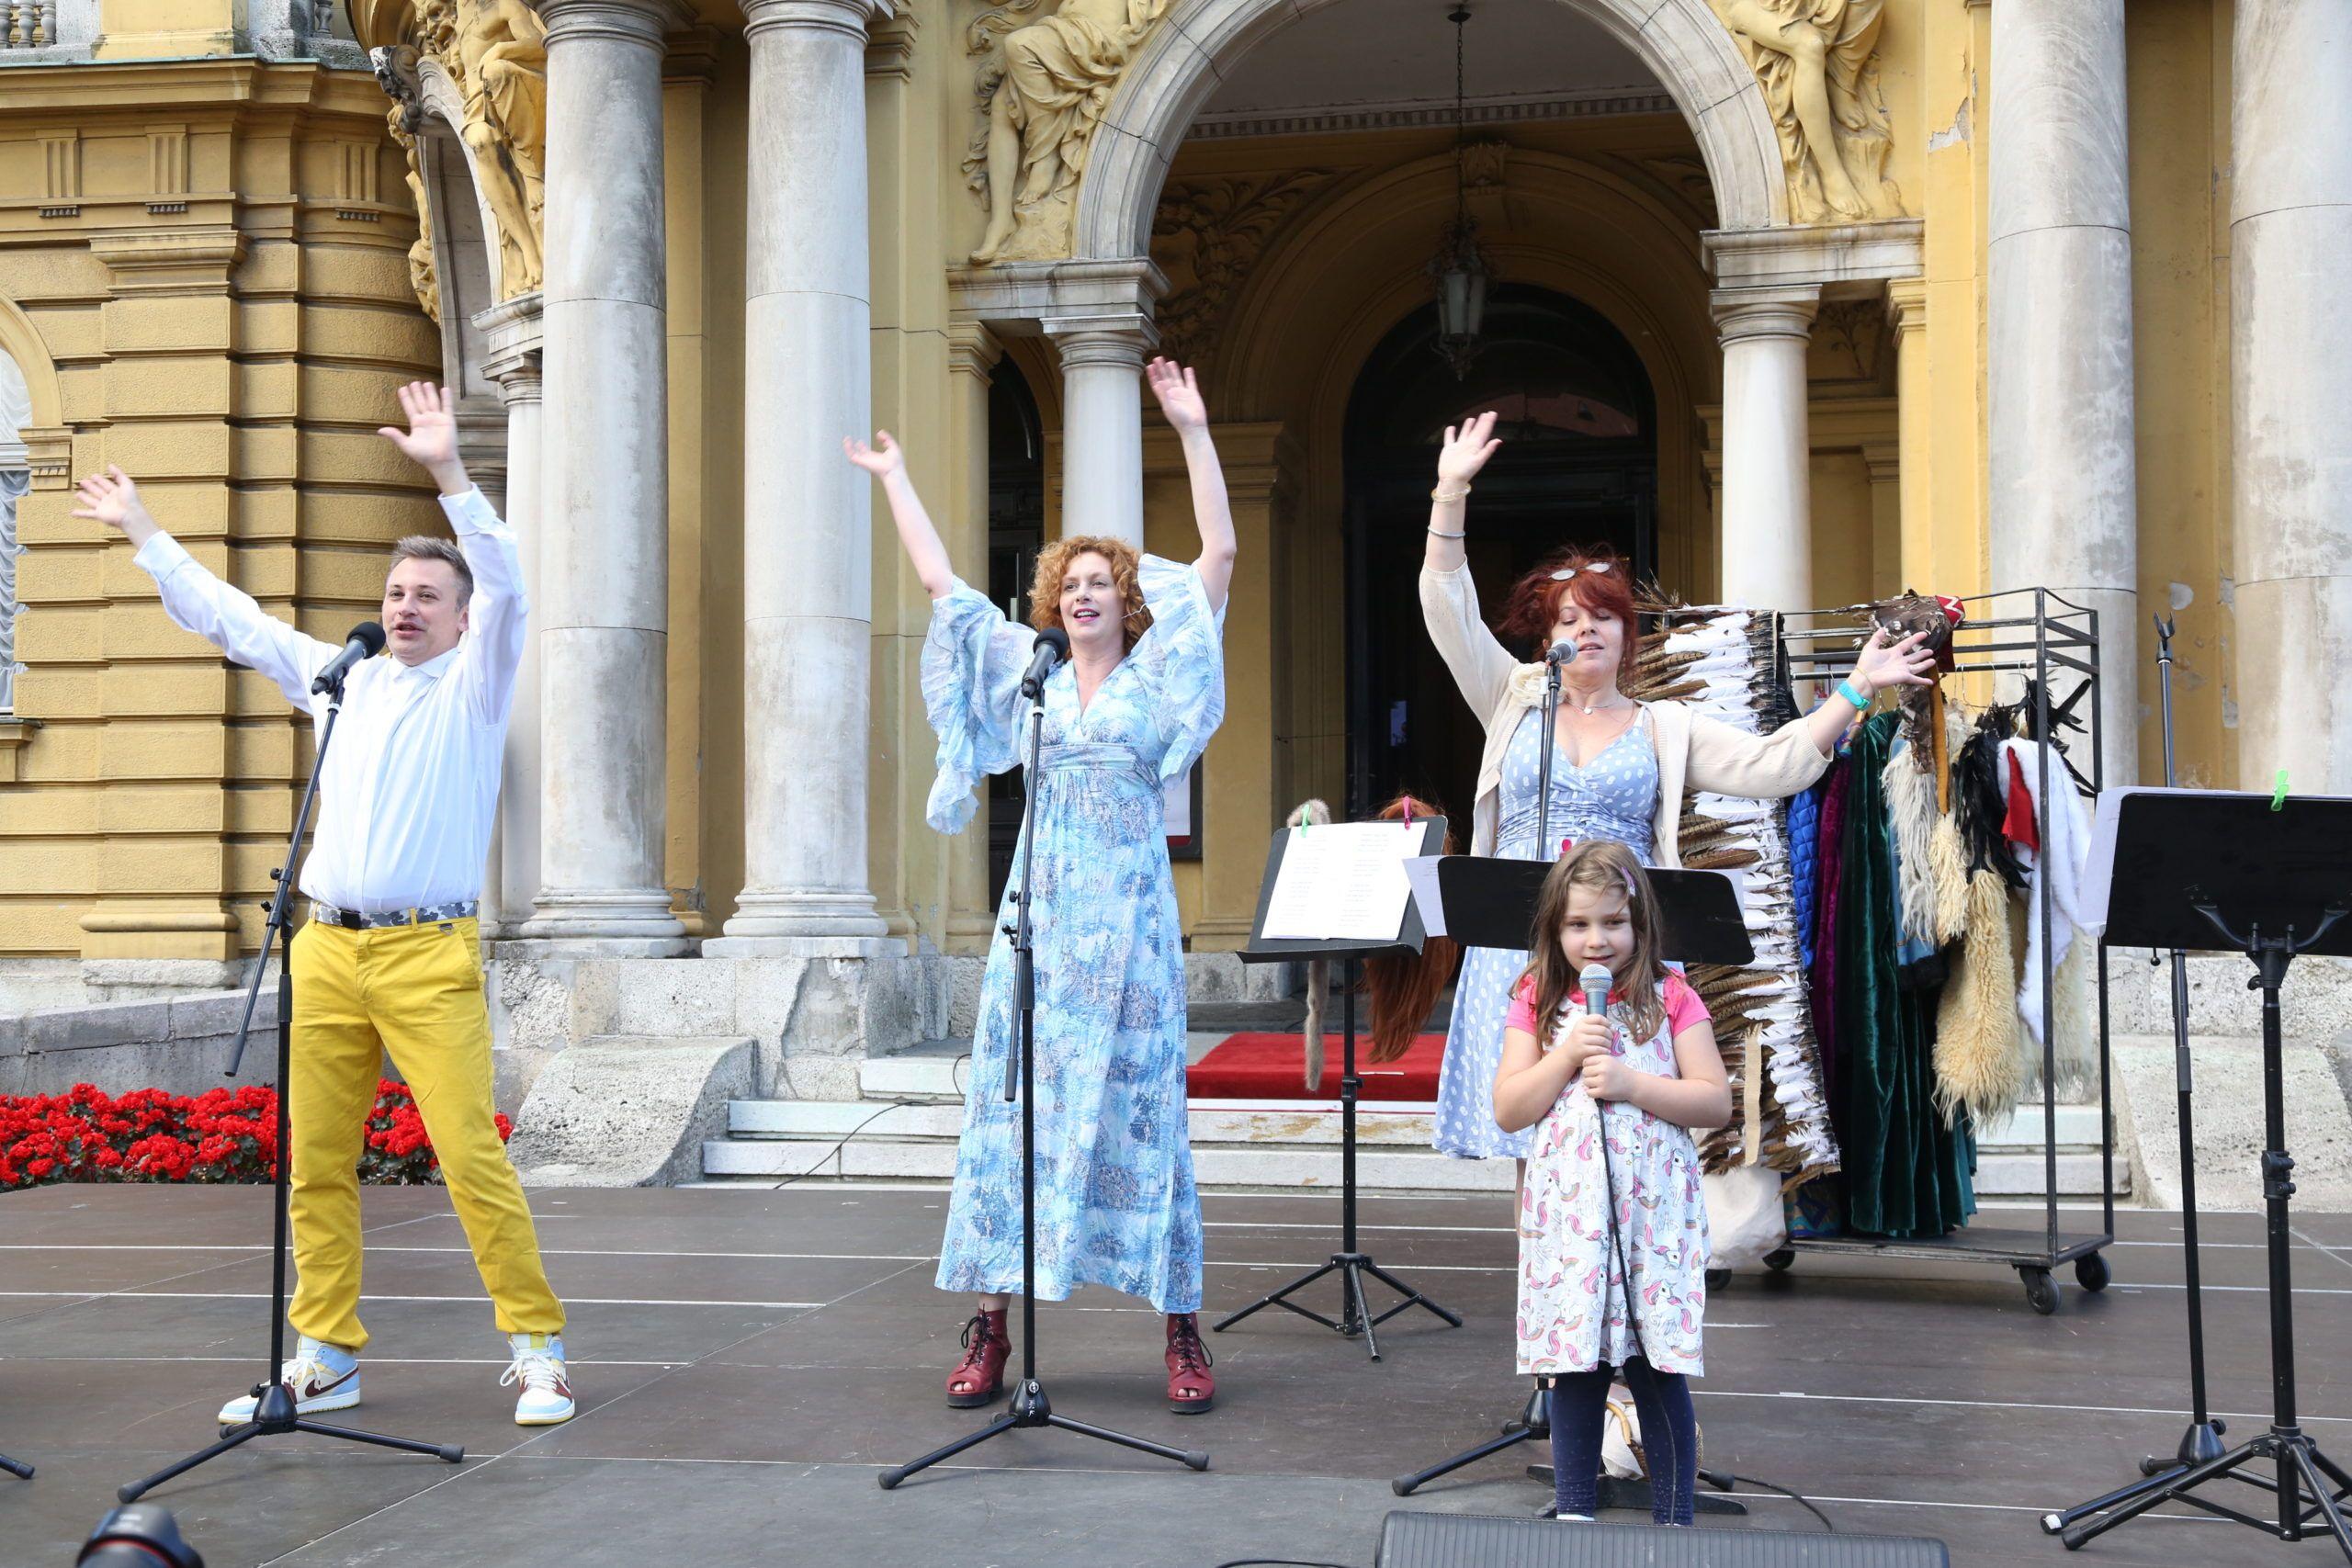 Karaokelektira: Nina Violić i Kristijan Beluhana rasplesali građane